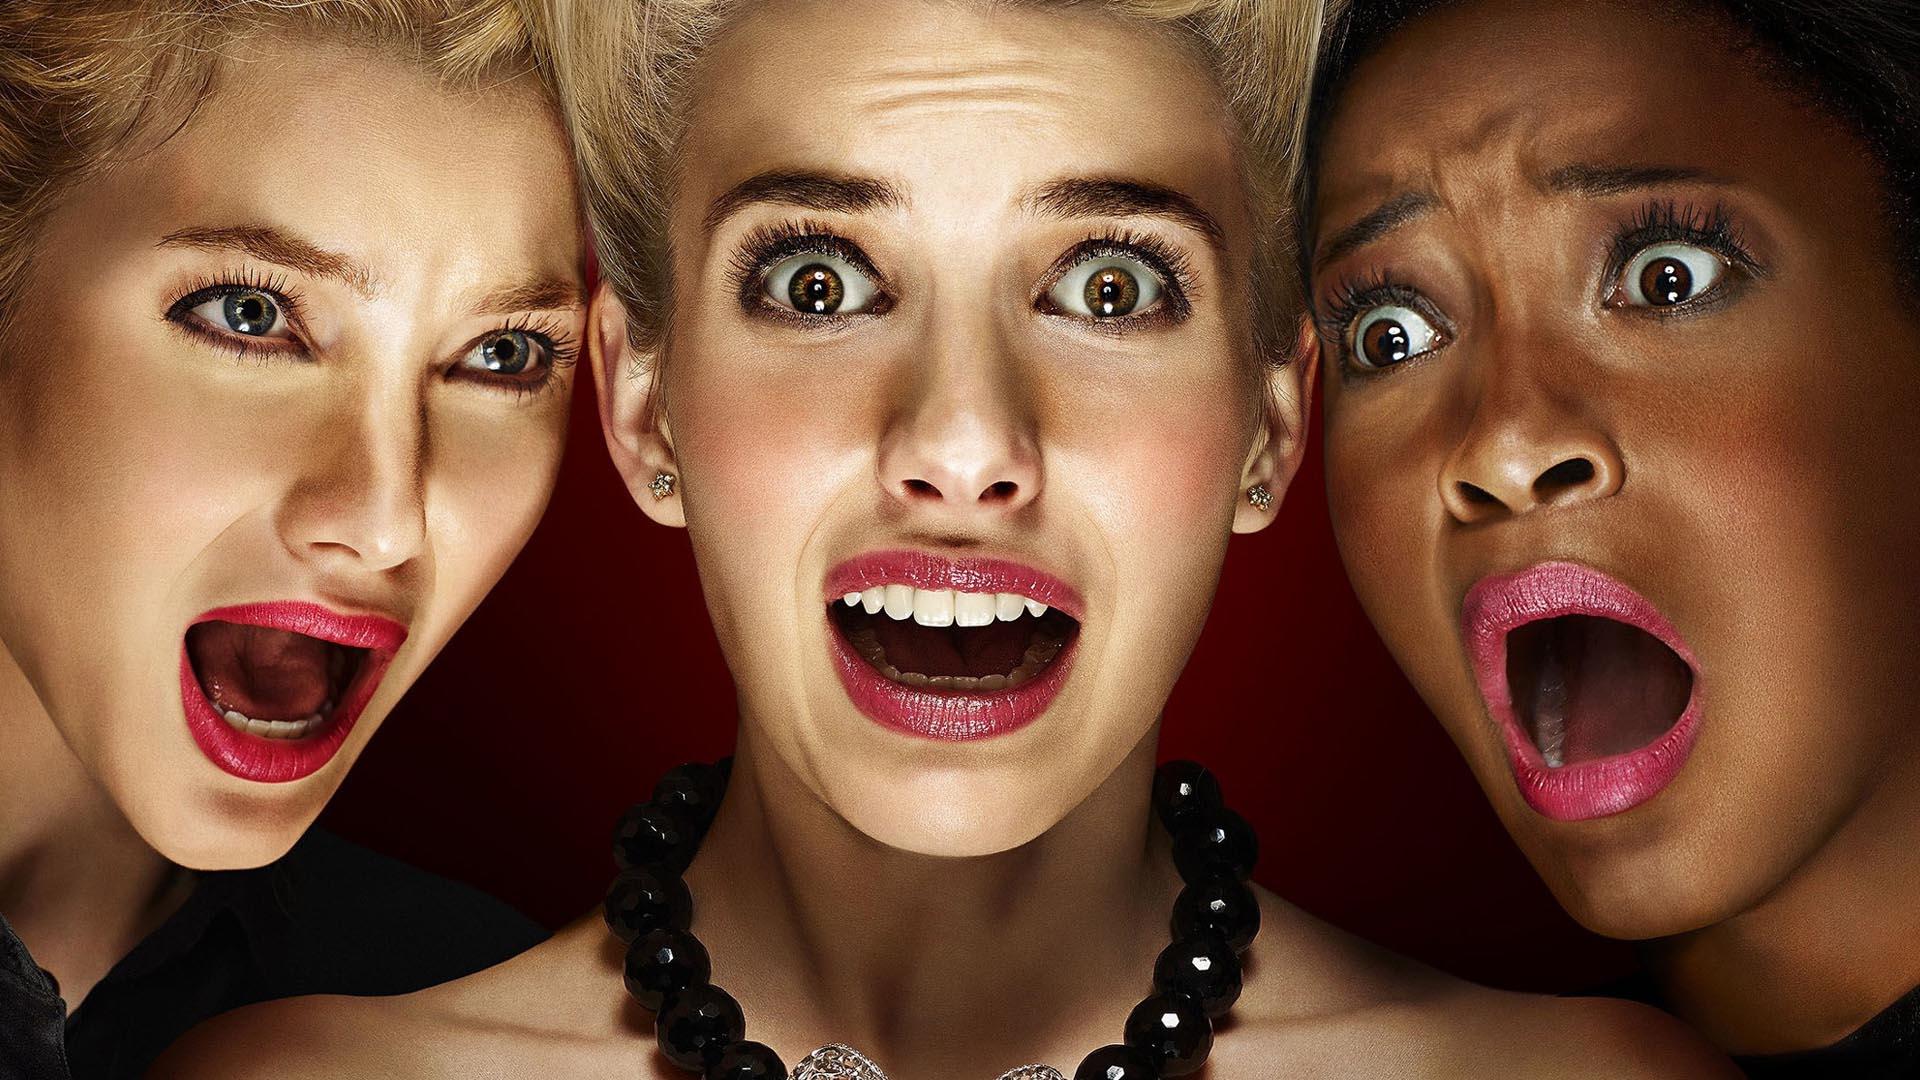 scream-queens-ban.jpg